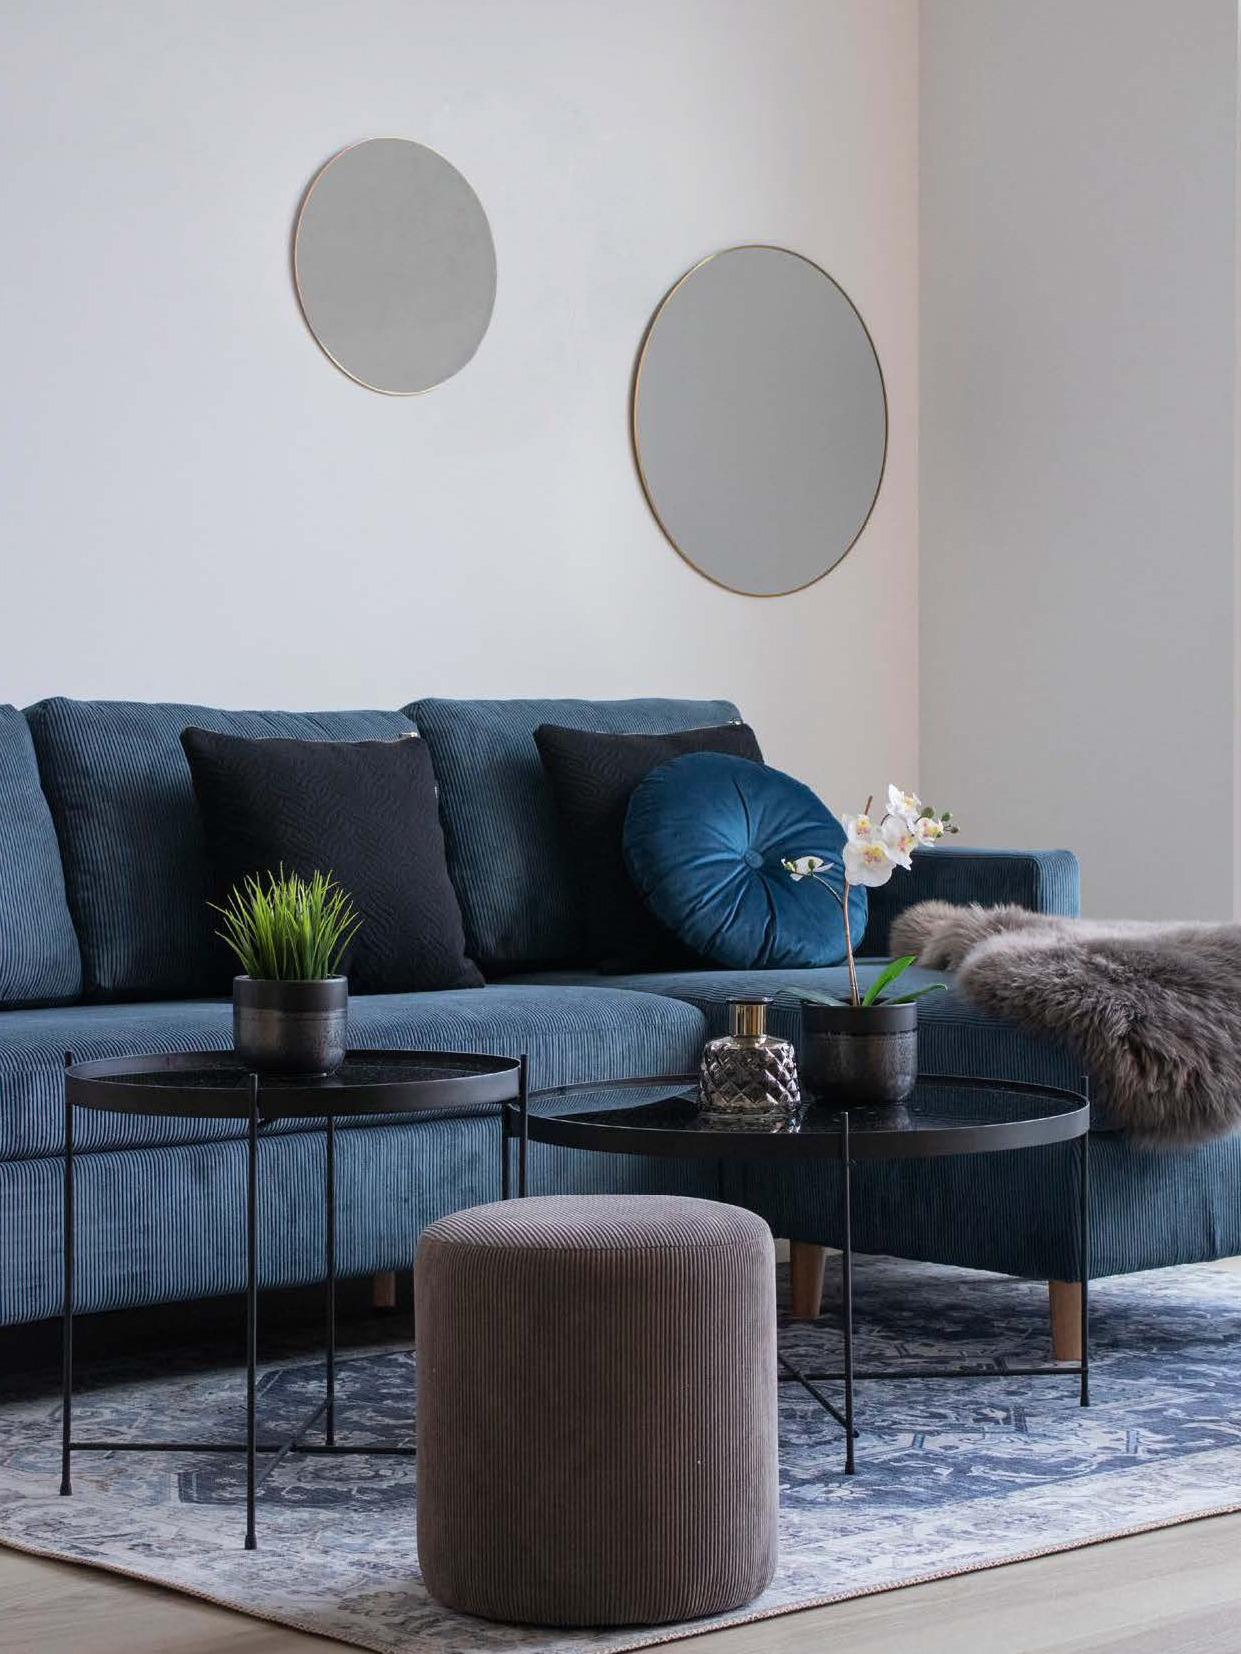 《House Nordic》2020春夏沙发系列Lookbook